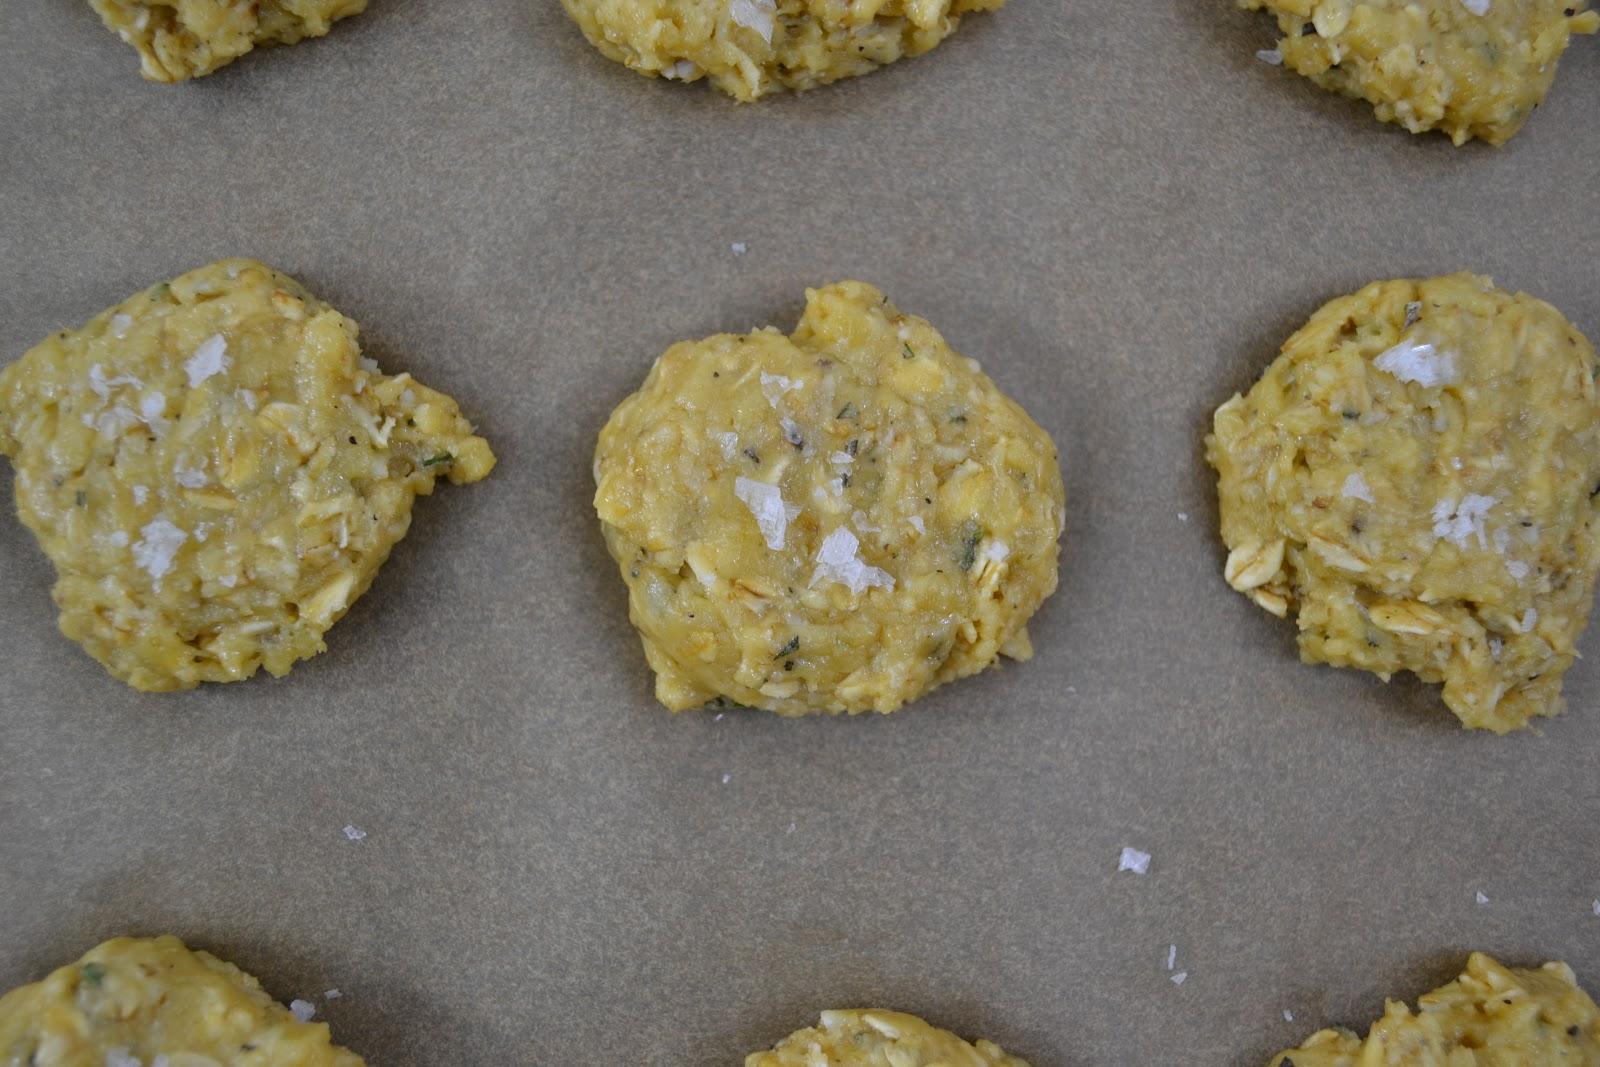 Savory Oatmeal Cookies (makes 18 cookies)